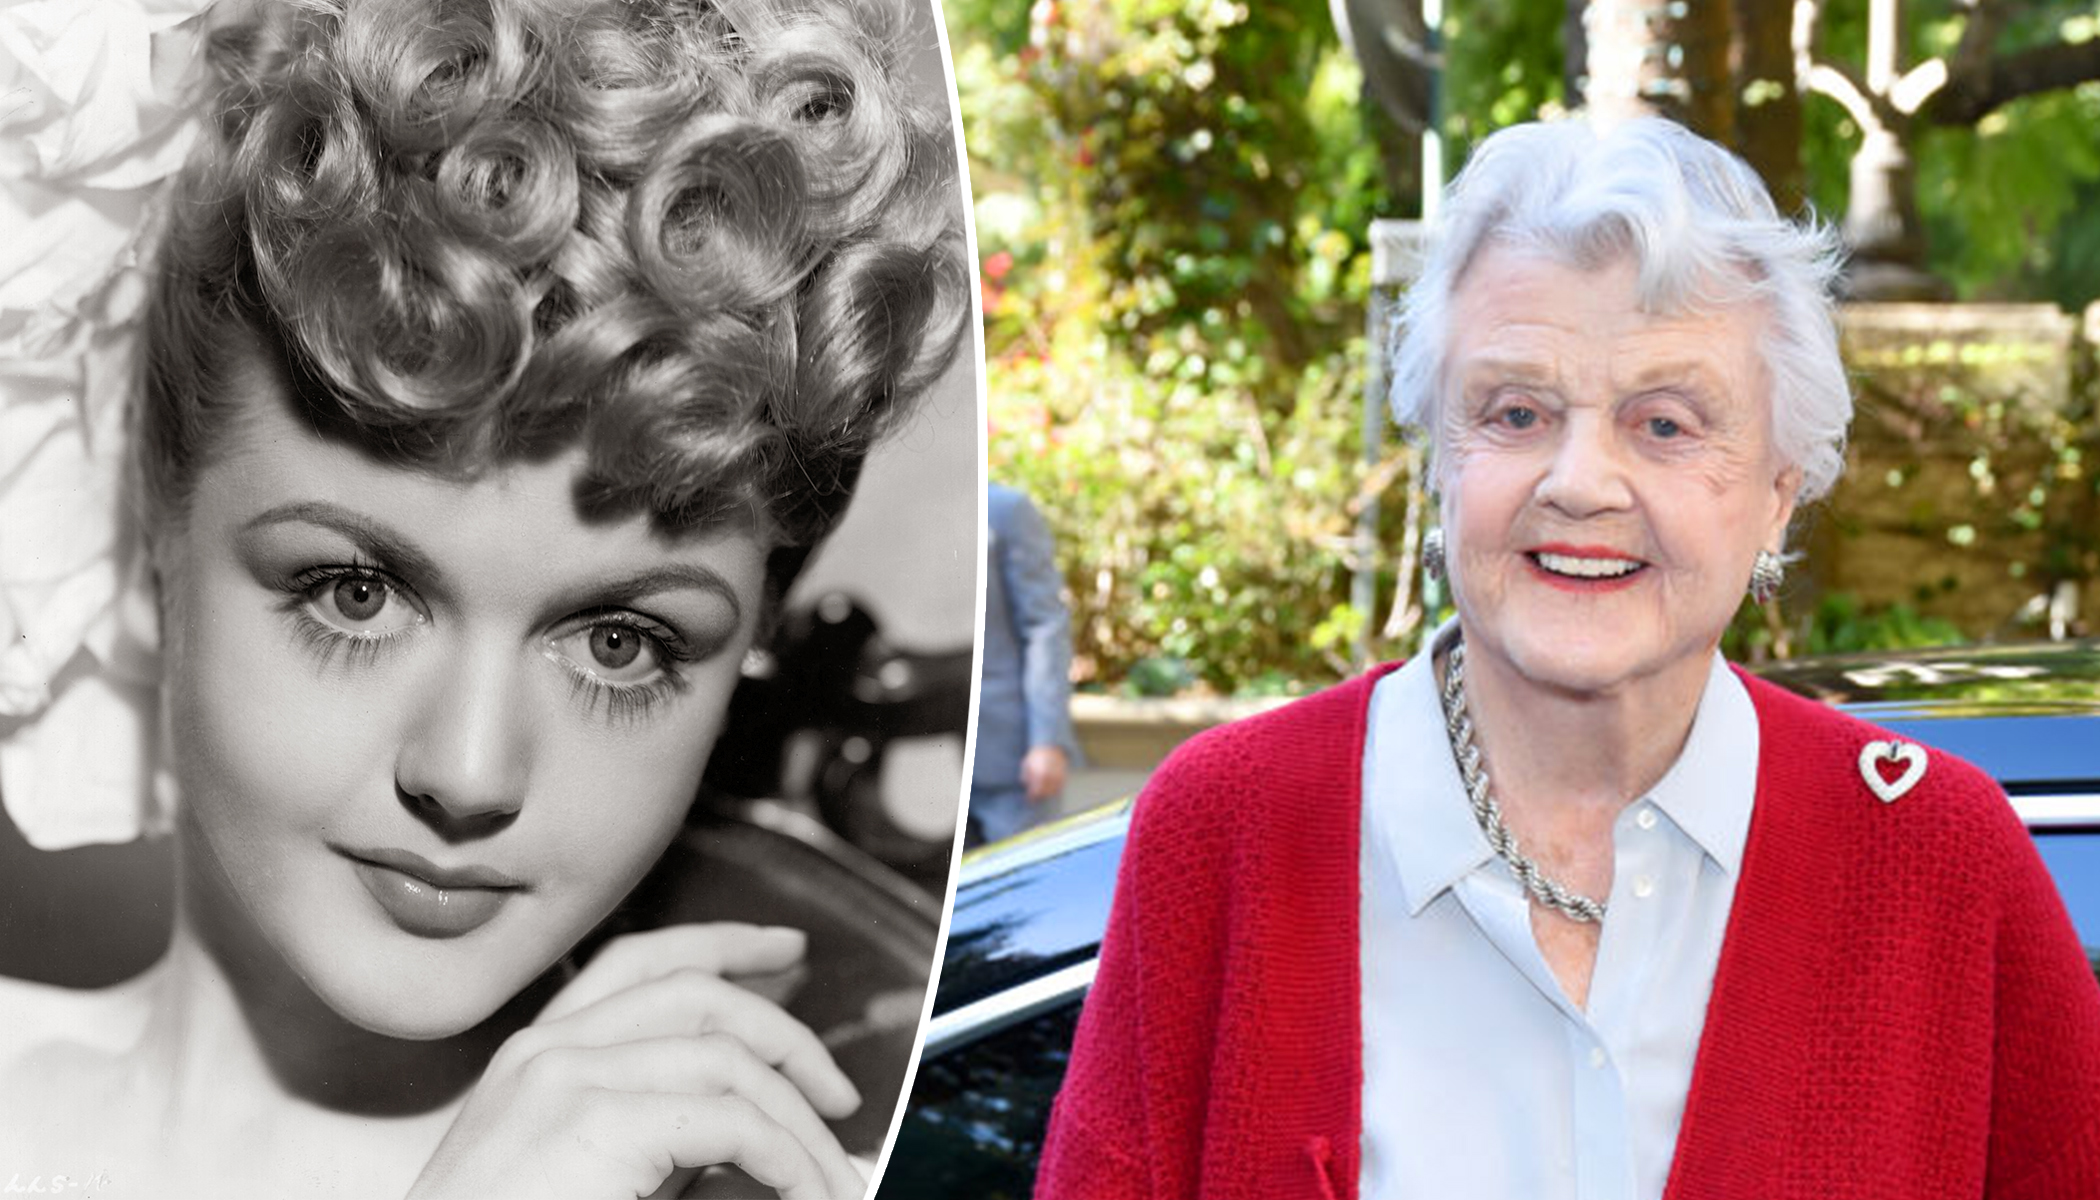 'Murder, She Wrote' Star, Stage & Screen Icon Angela Lansbury Celebrates 94th Birthday